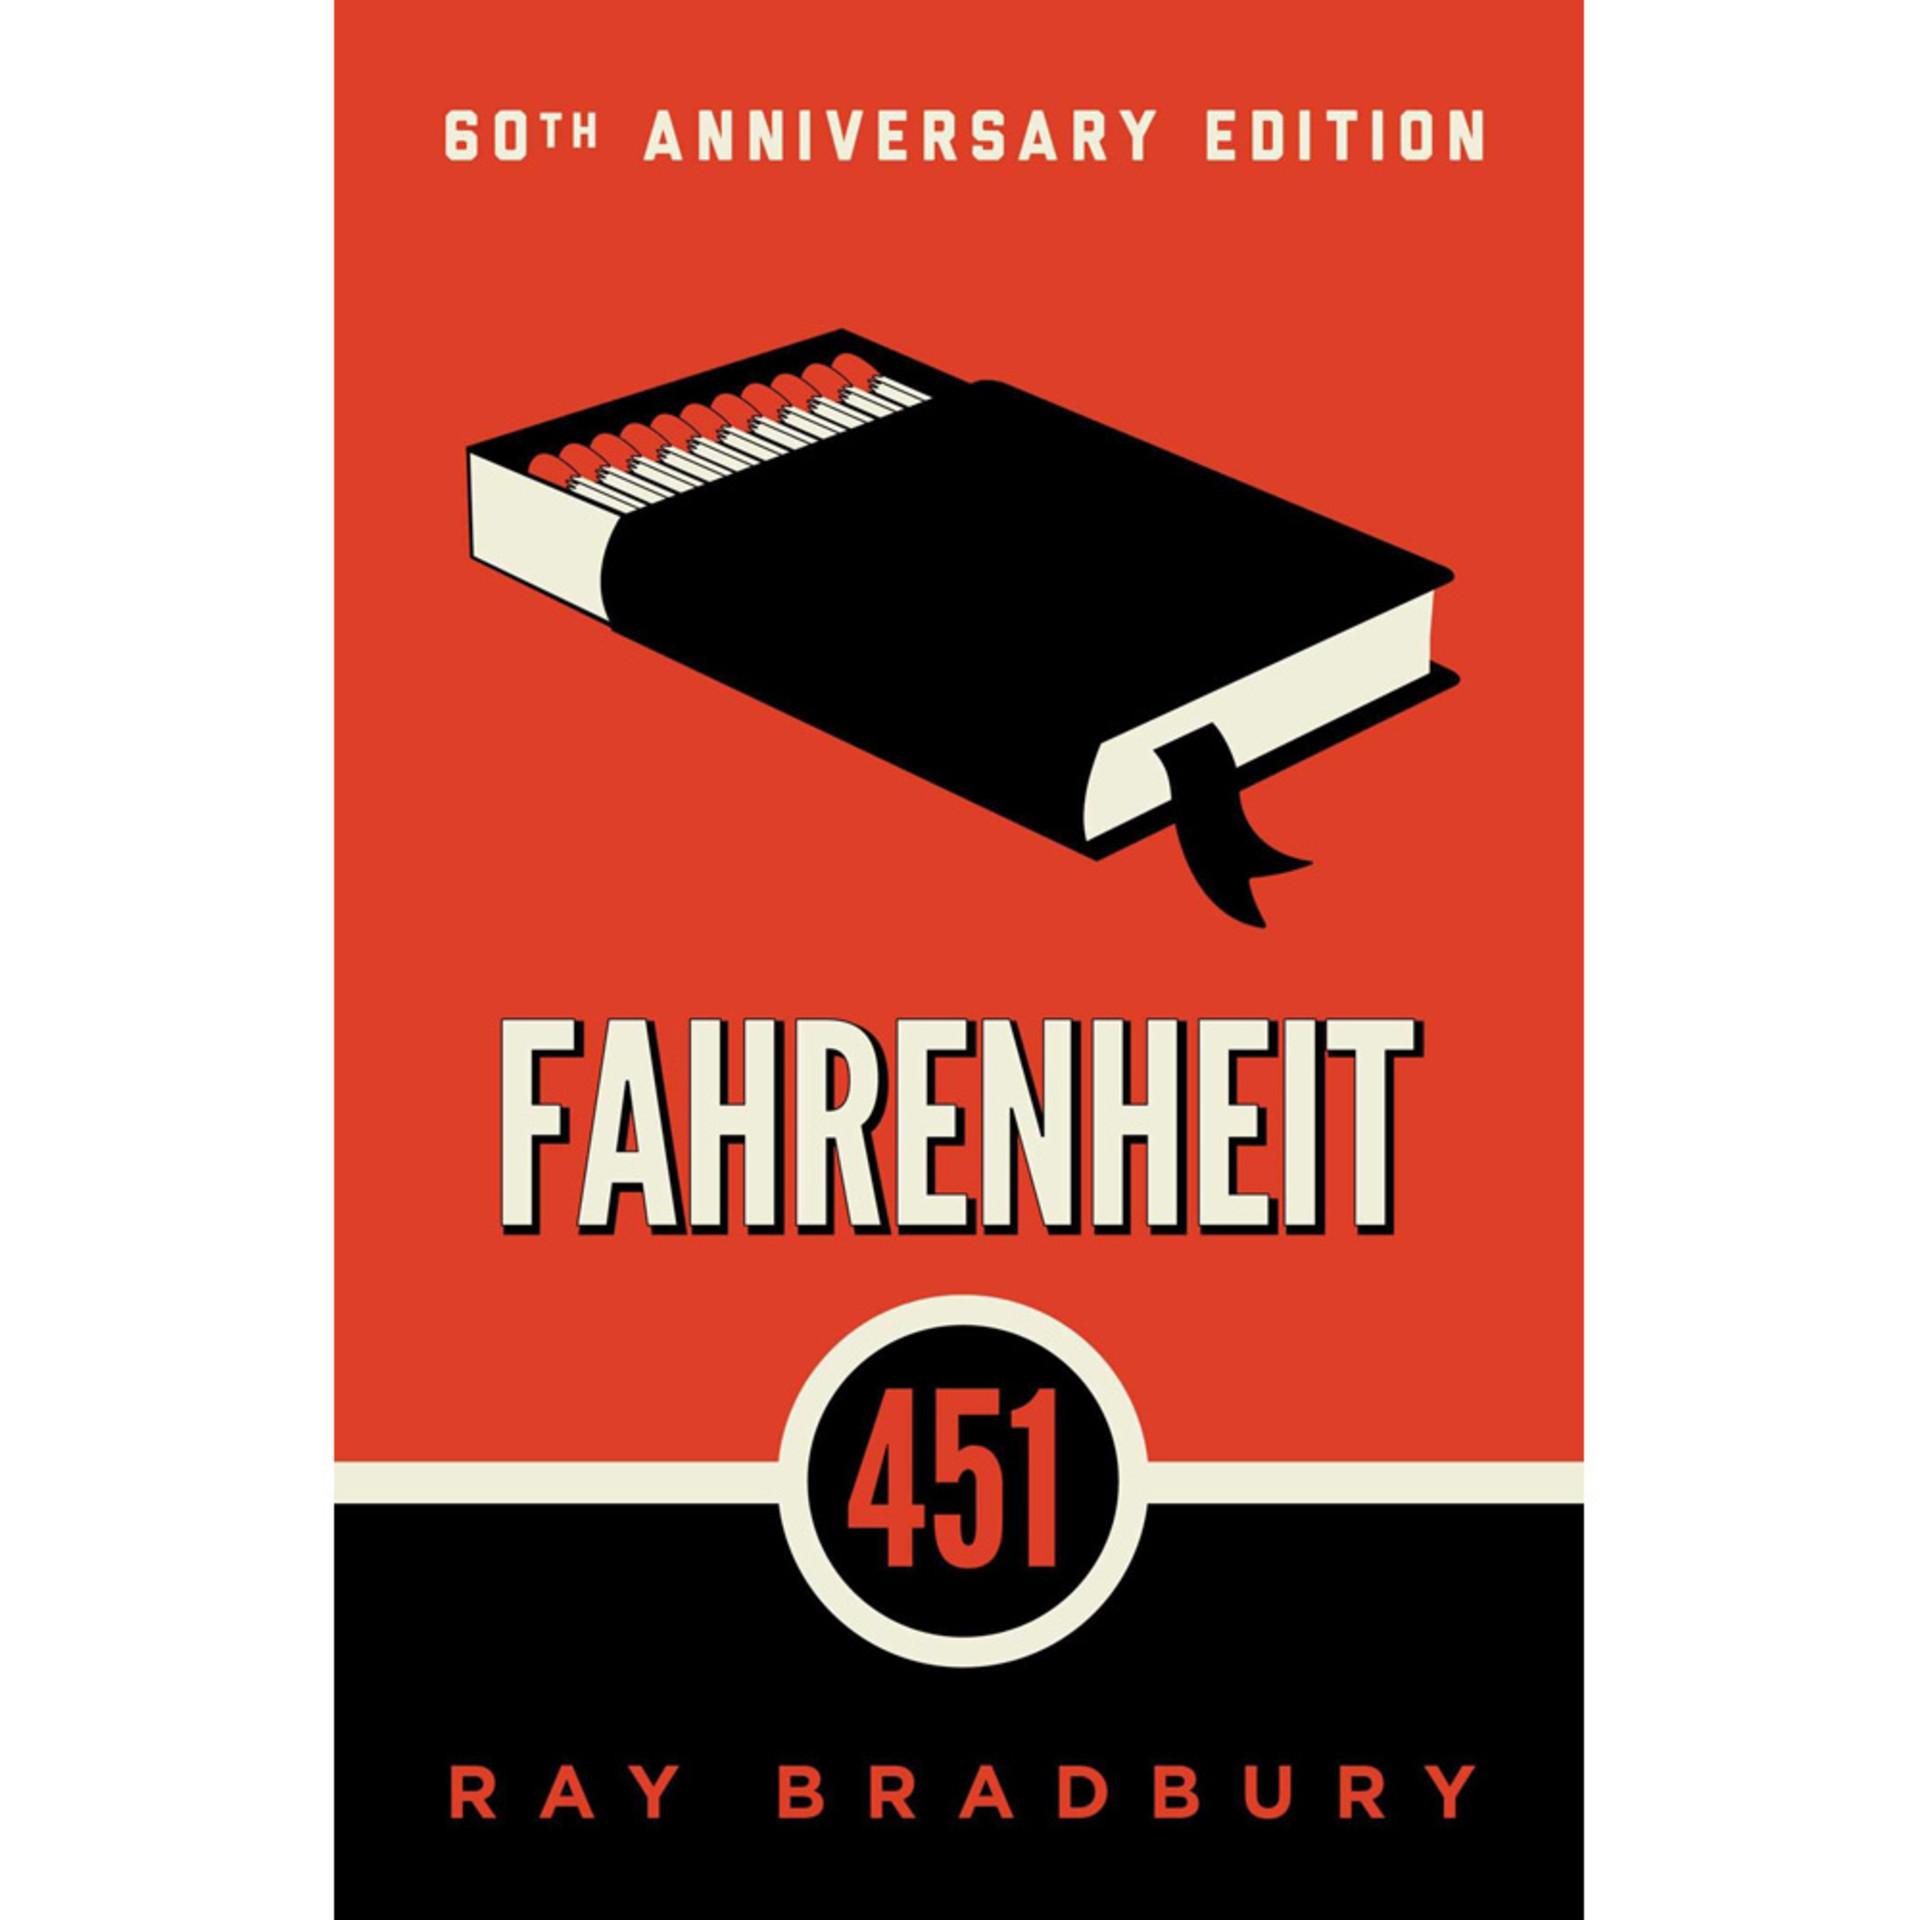 Fahrenheit 451: 60th Anniversary Edition by Ray Bradbury